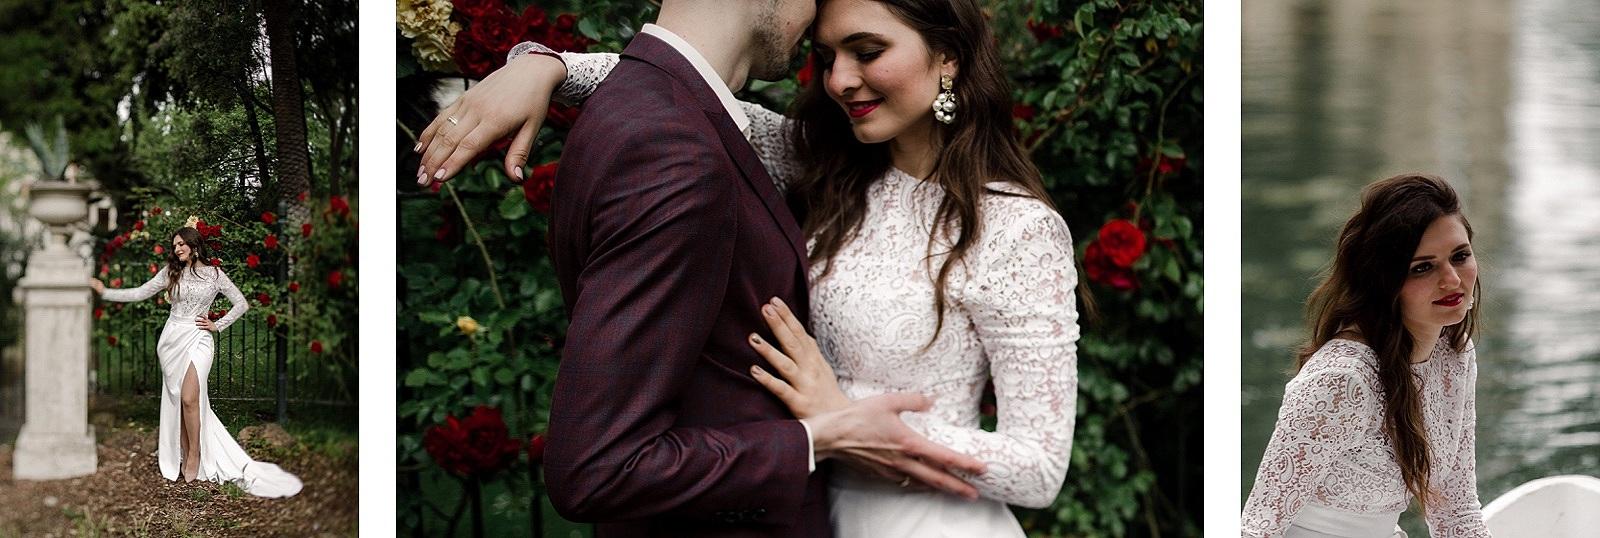 Fotomagoria Wedding Rome Photographer 32.jpg